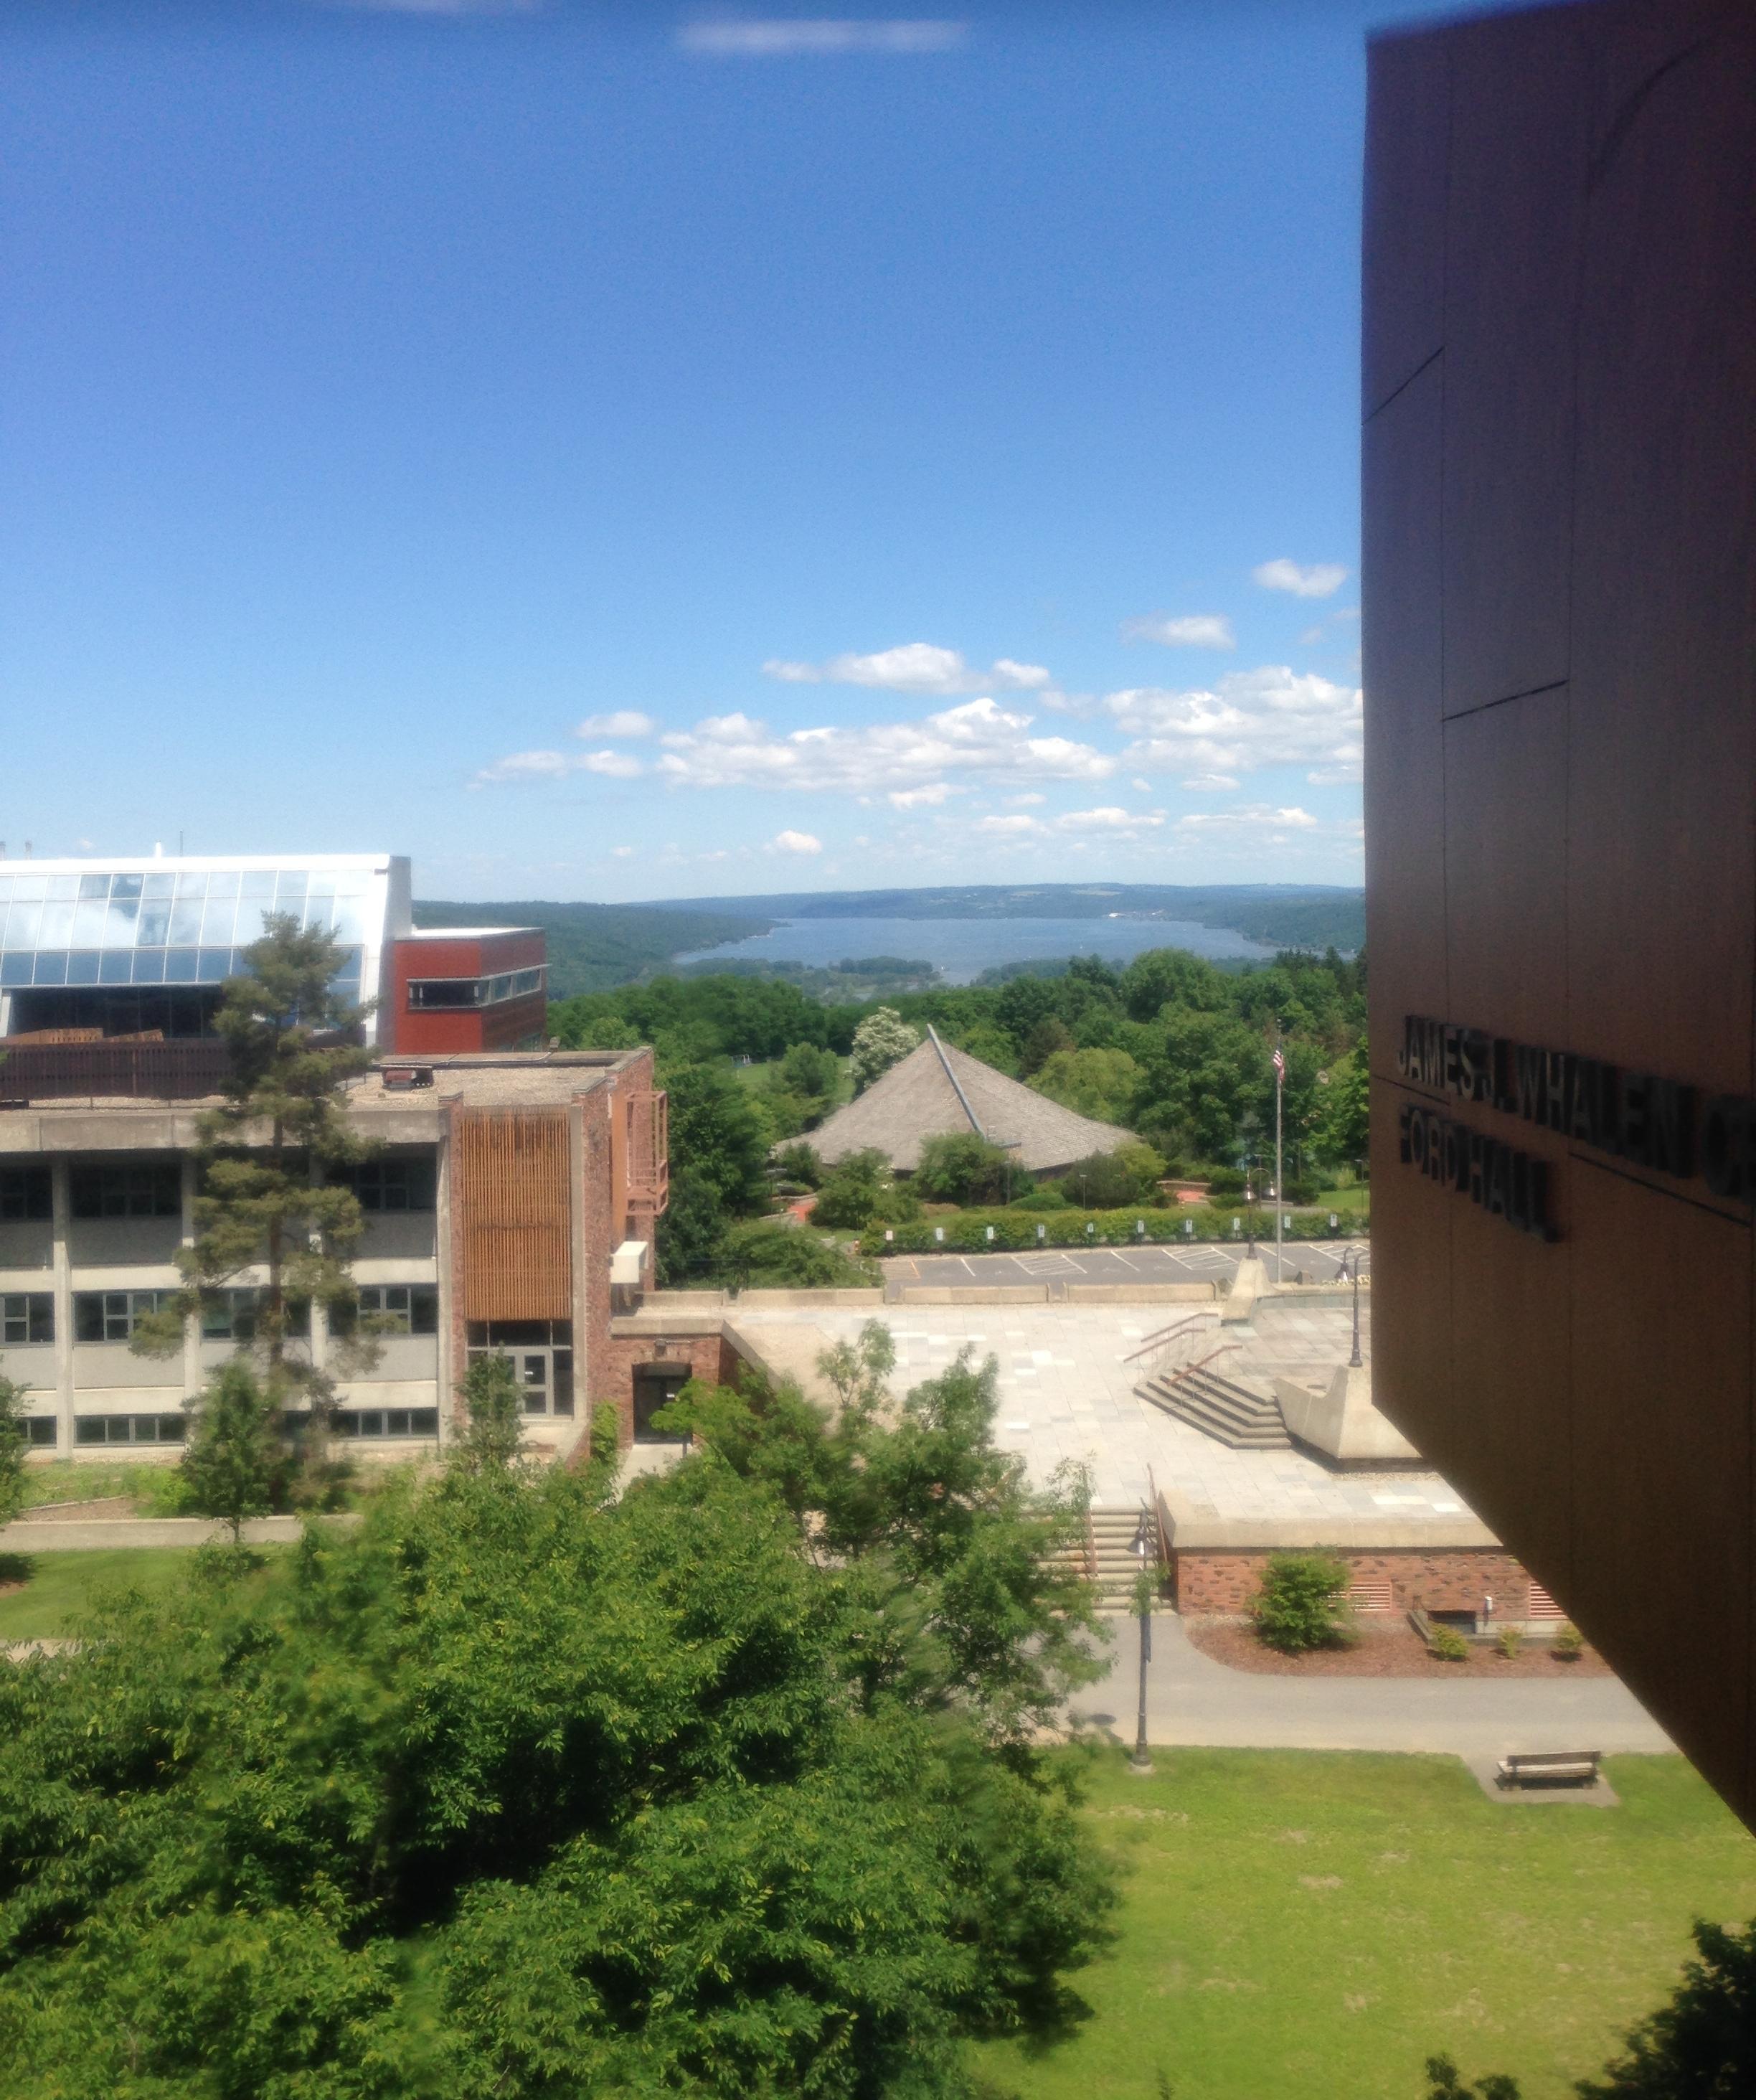 Ithaca College campus + Lake Cayuga